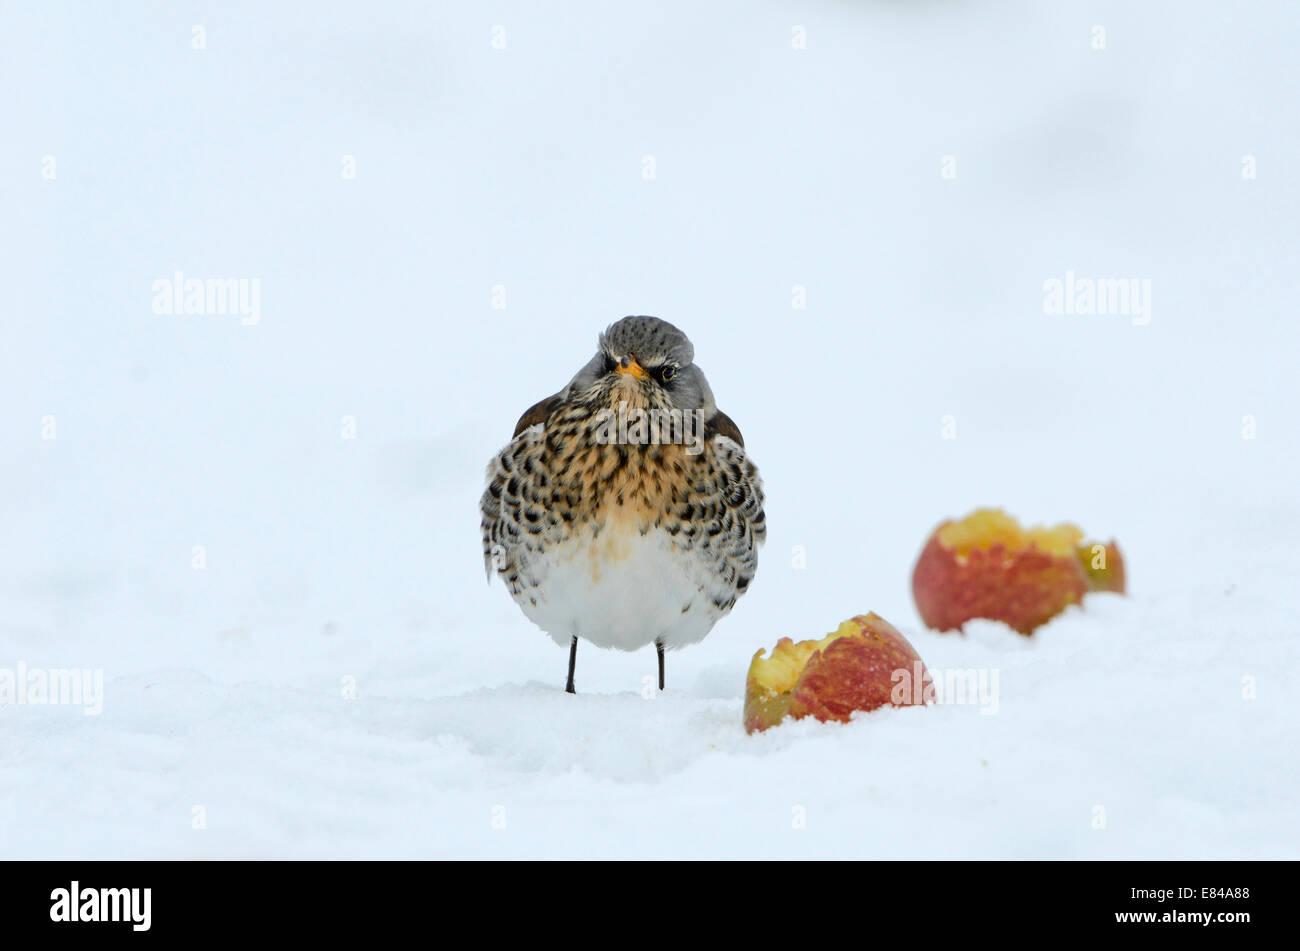 Fieldfare  Turdus pilaris feeding on apples in snow Norfolk - Stock Image